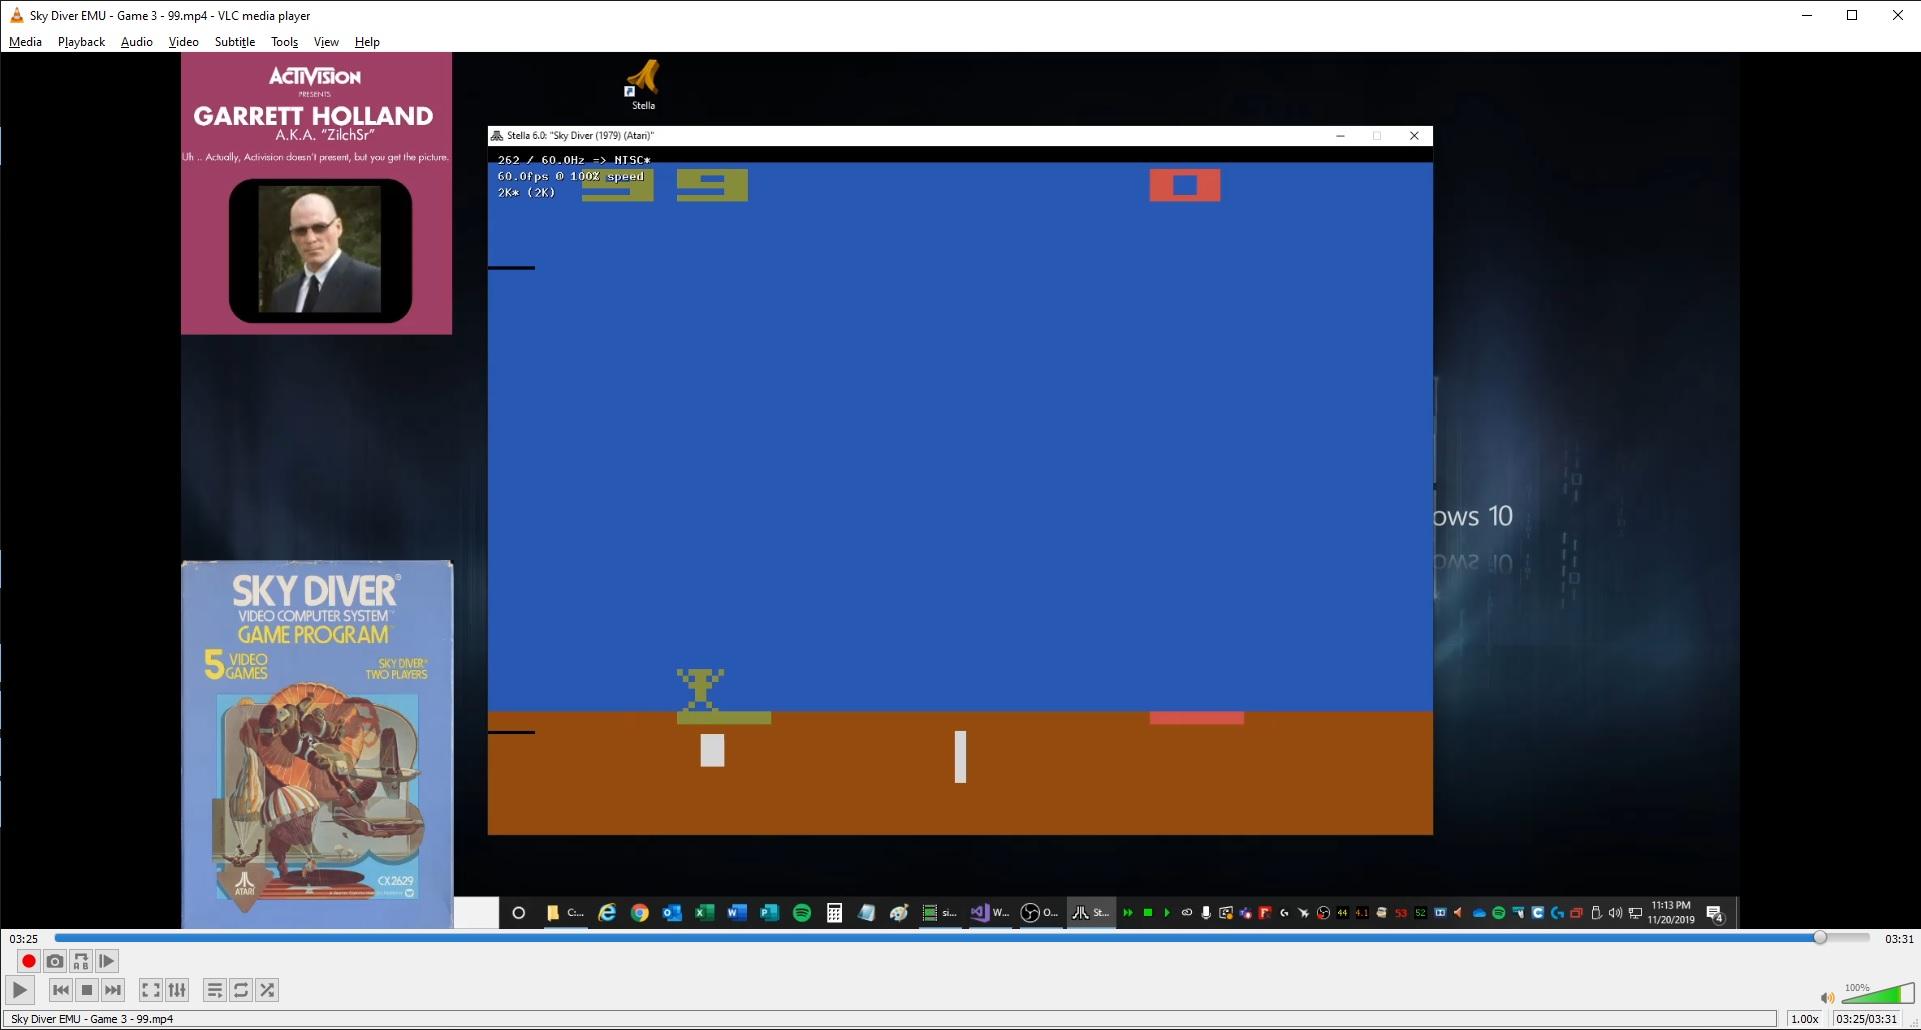 ZilchSr: Sky Diver: Game 3 (Atari 2600 Emulated Novice/B Mode) 99 points on 2019-12-01 17:33:47